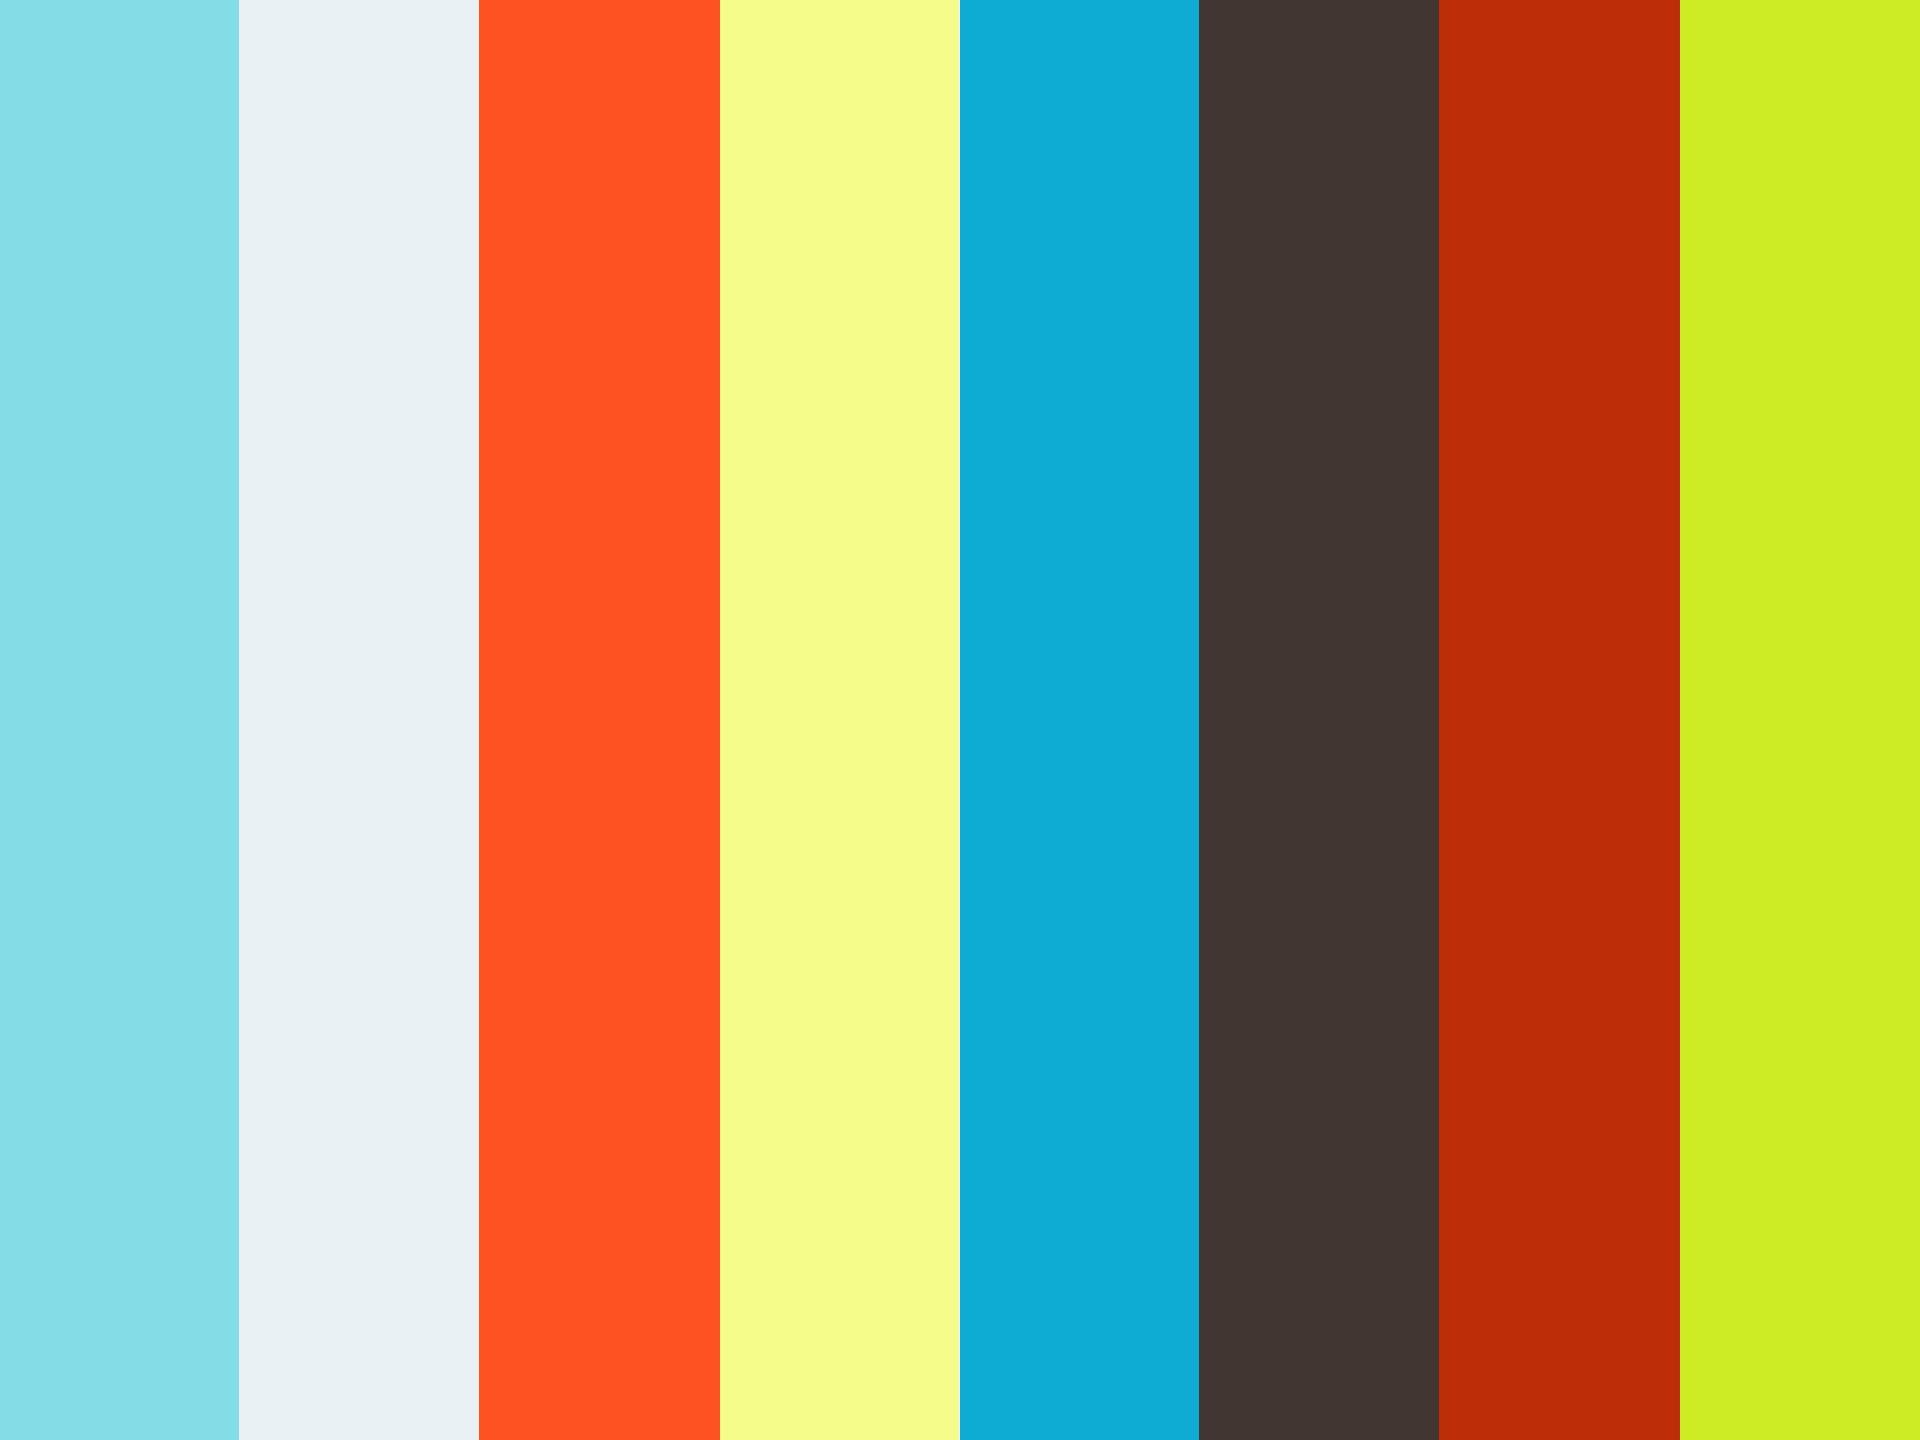 【special】内山徹哉先生:⑩クラウン修復の心臓であるプロビジョナルレストレーション 〜その役割と補綴前処置の必要性 印象採得法まで〜 #1